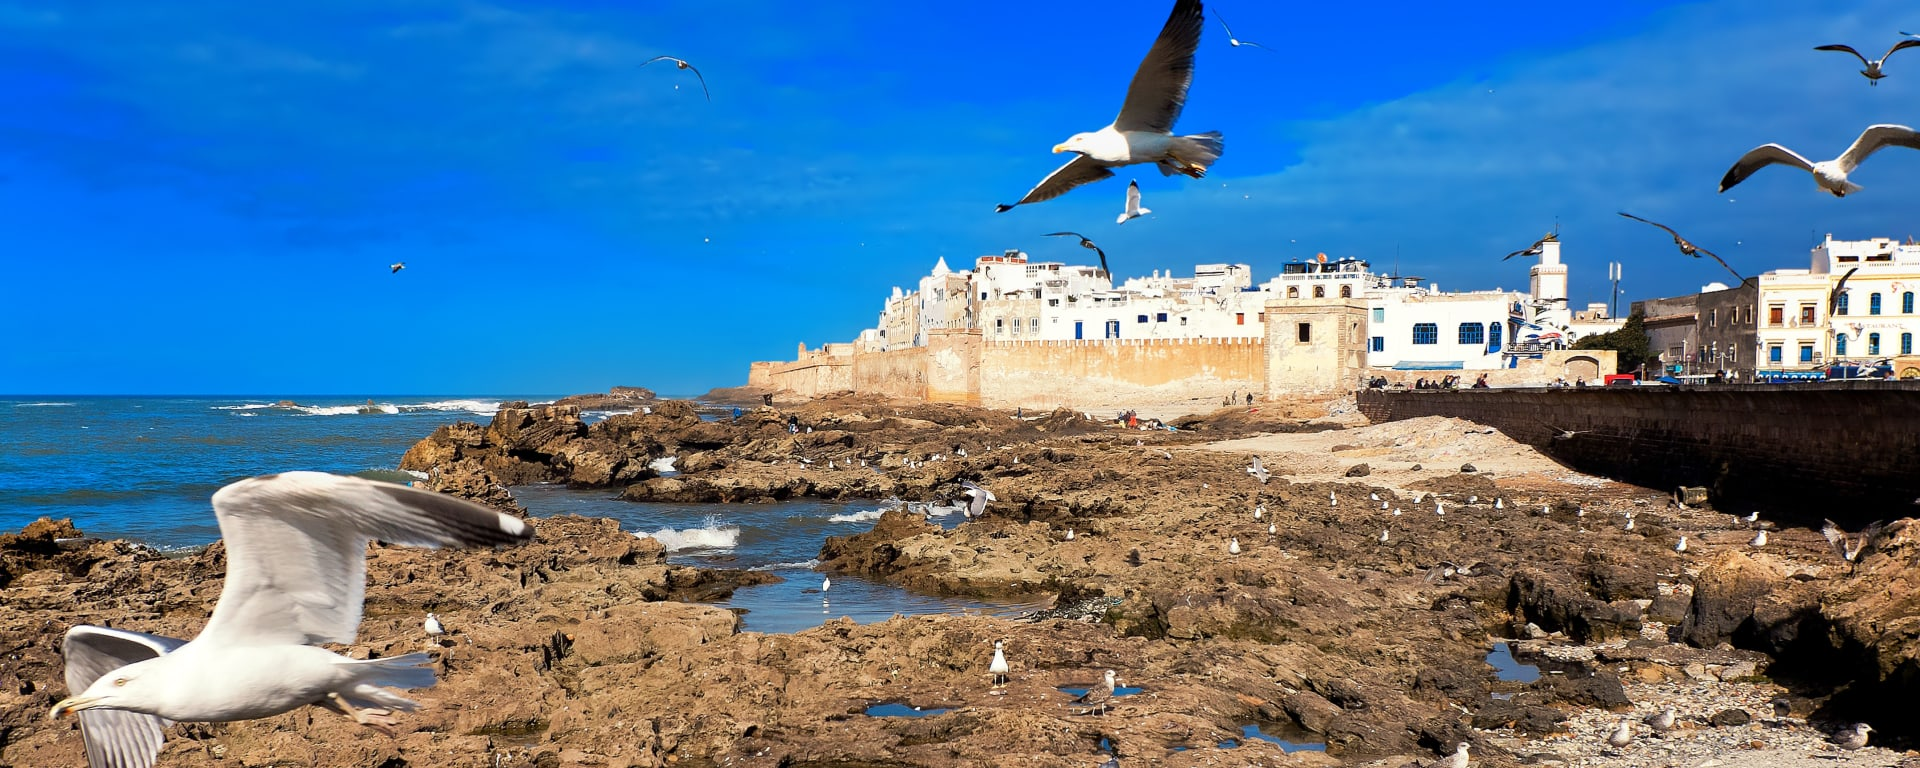 Marokko entdecken mit Tischler Reisen: Marokko Atlantikkueste Essaouira